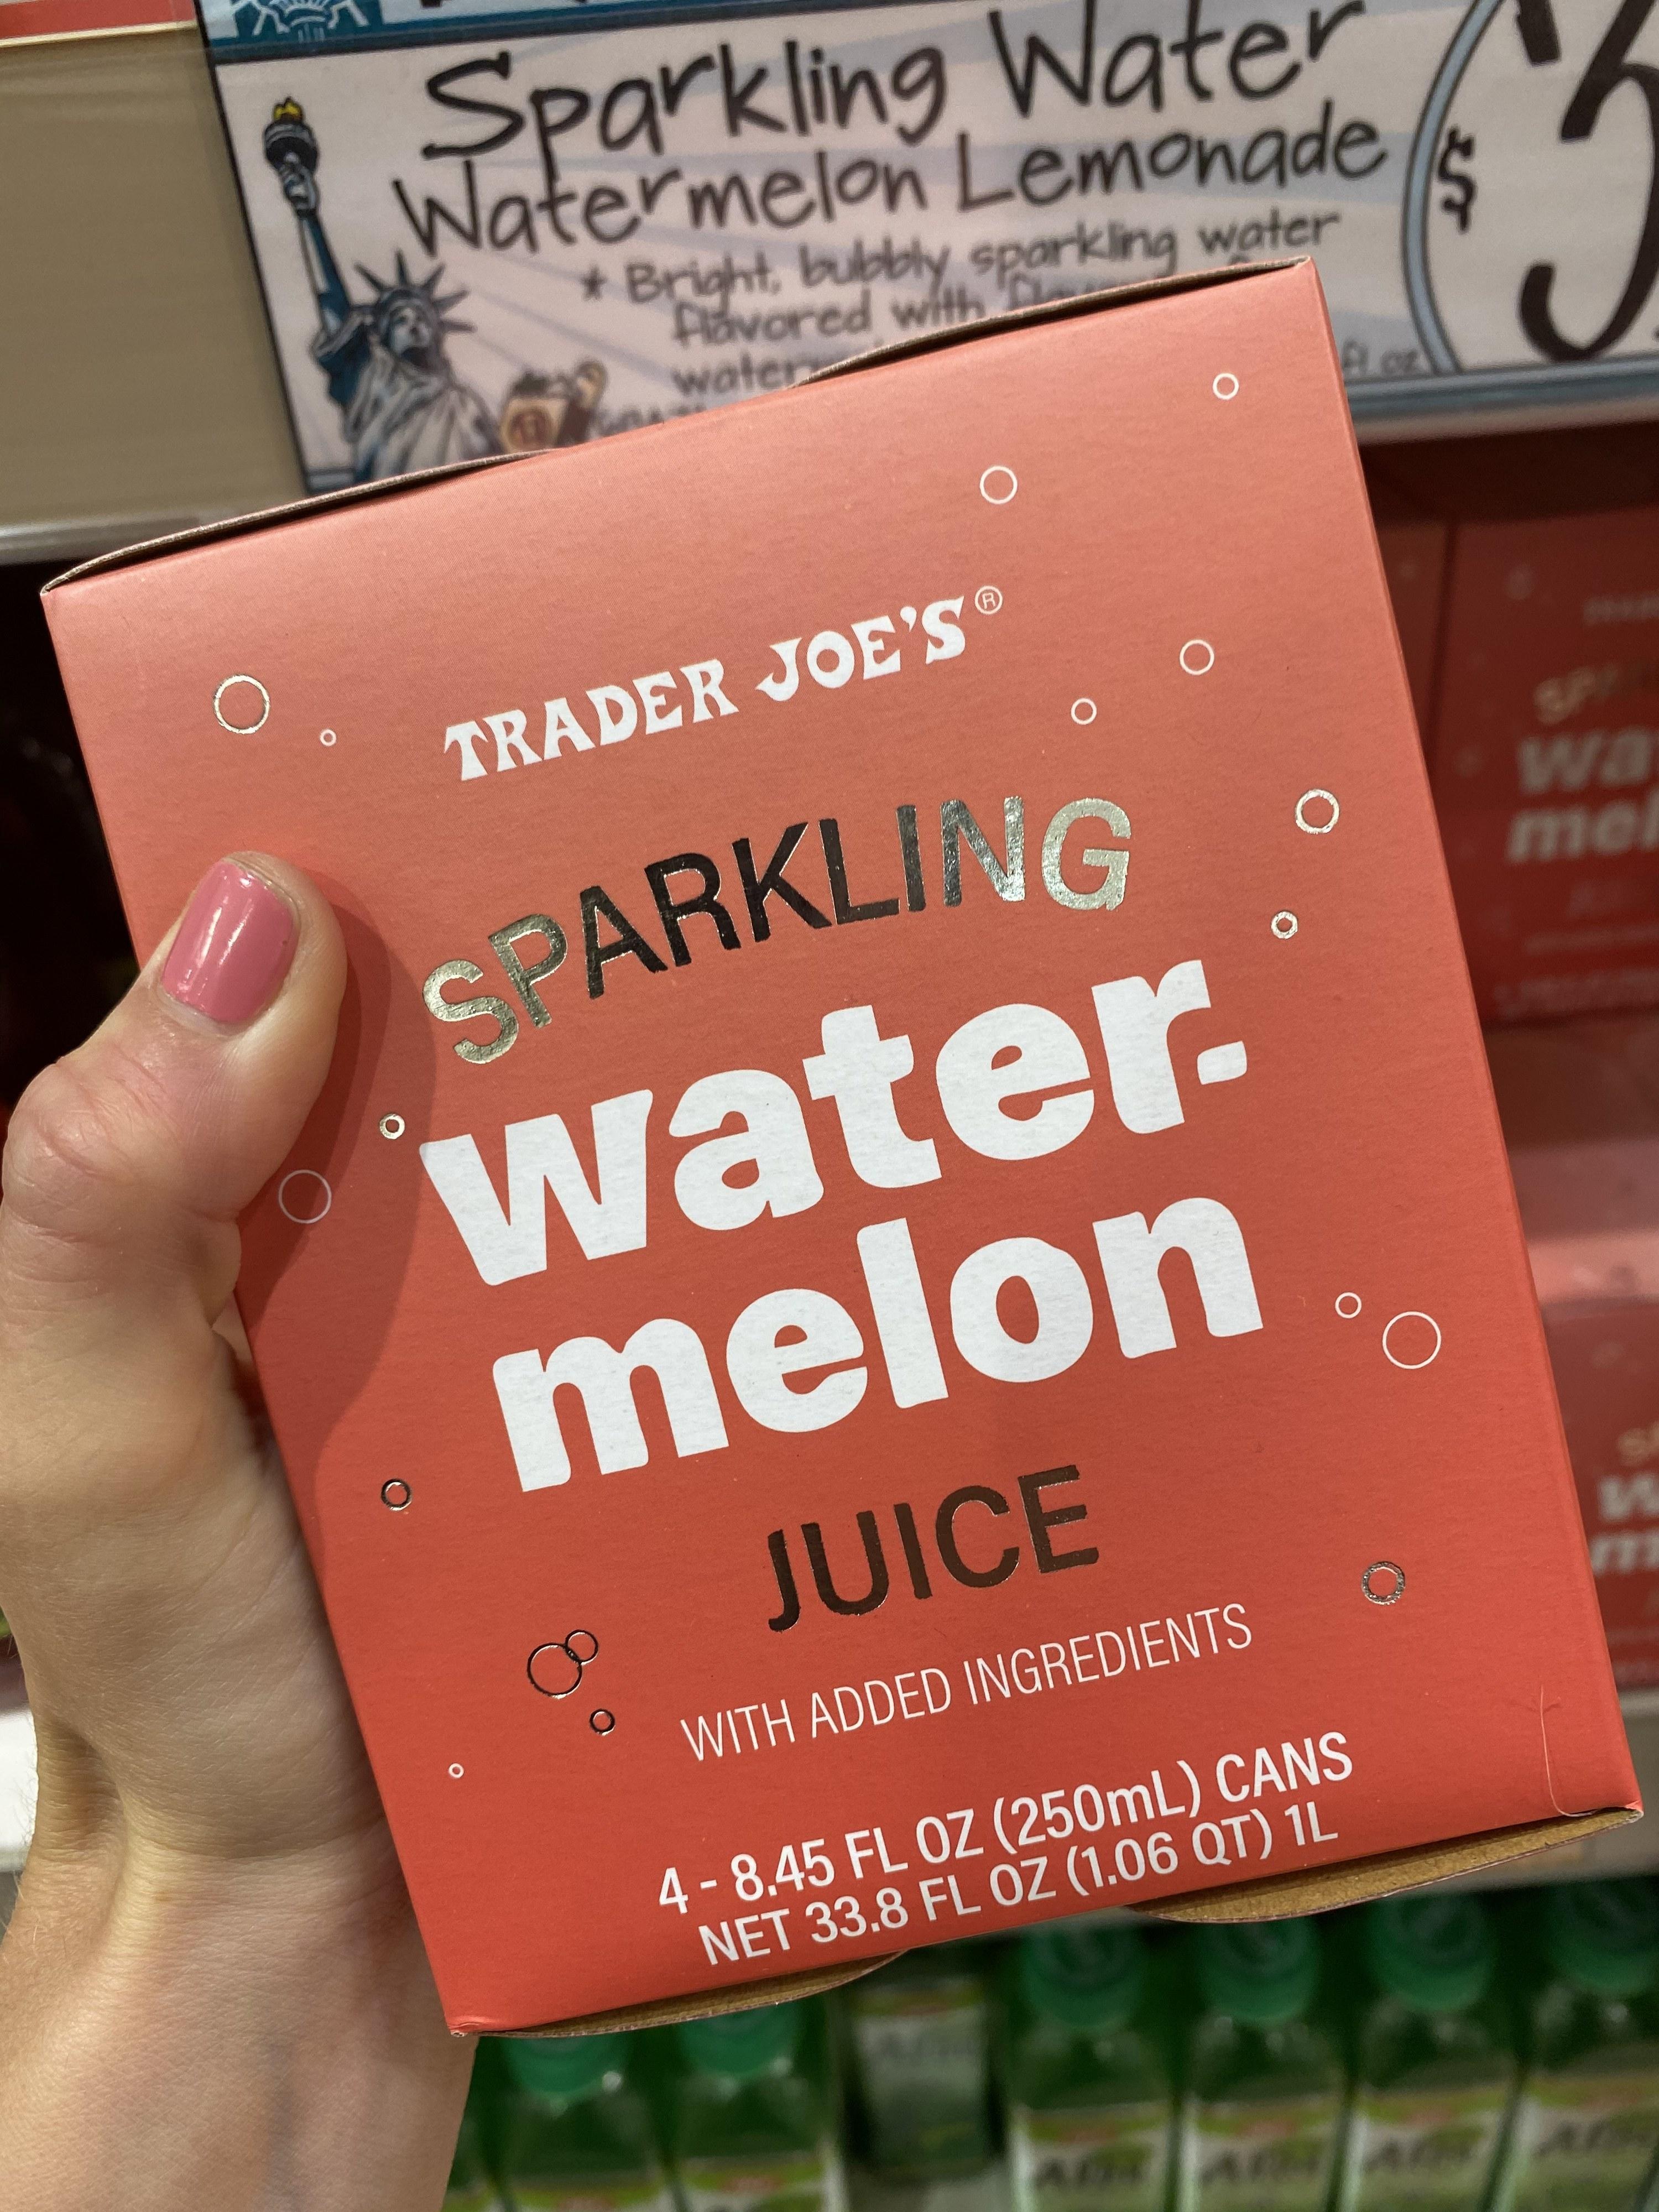 A box of Trader Joe's sparkling watermelon juice.